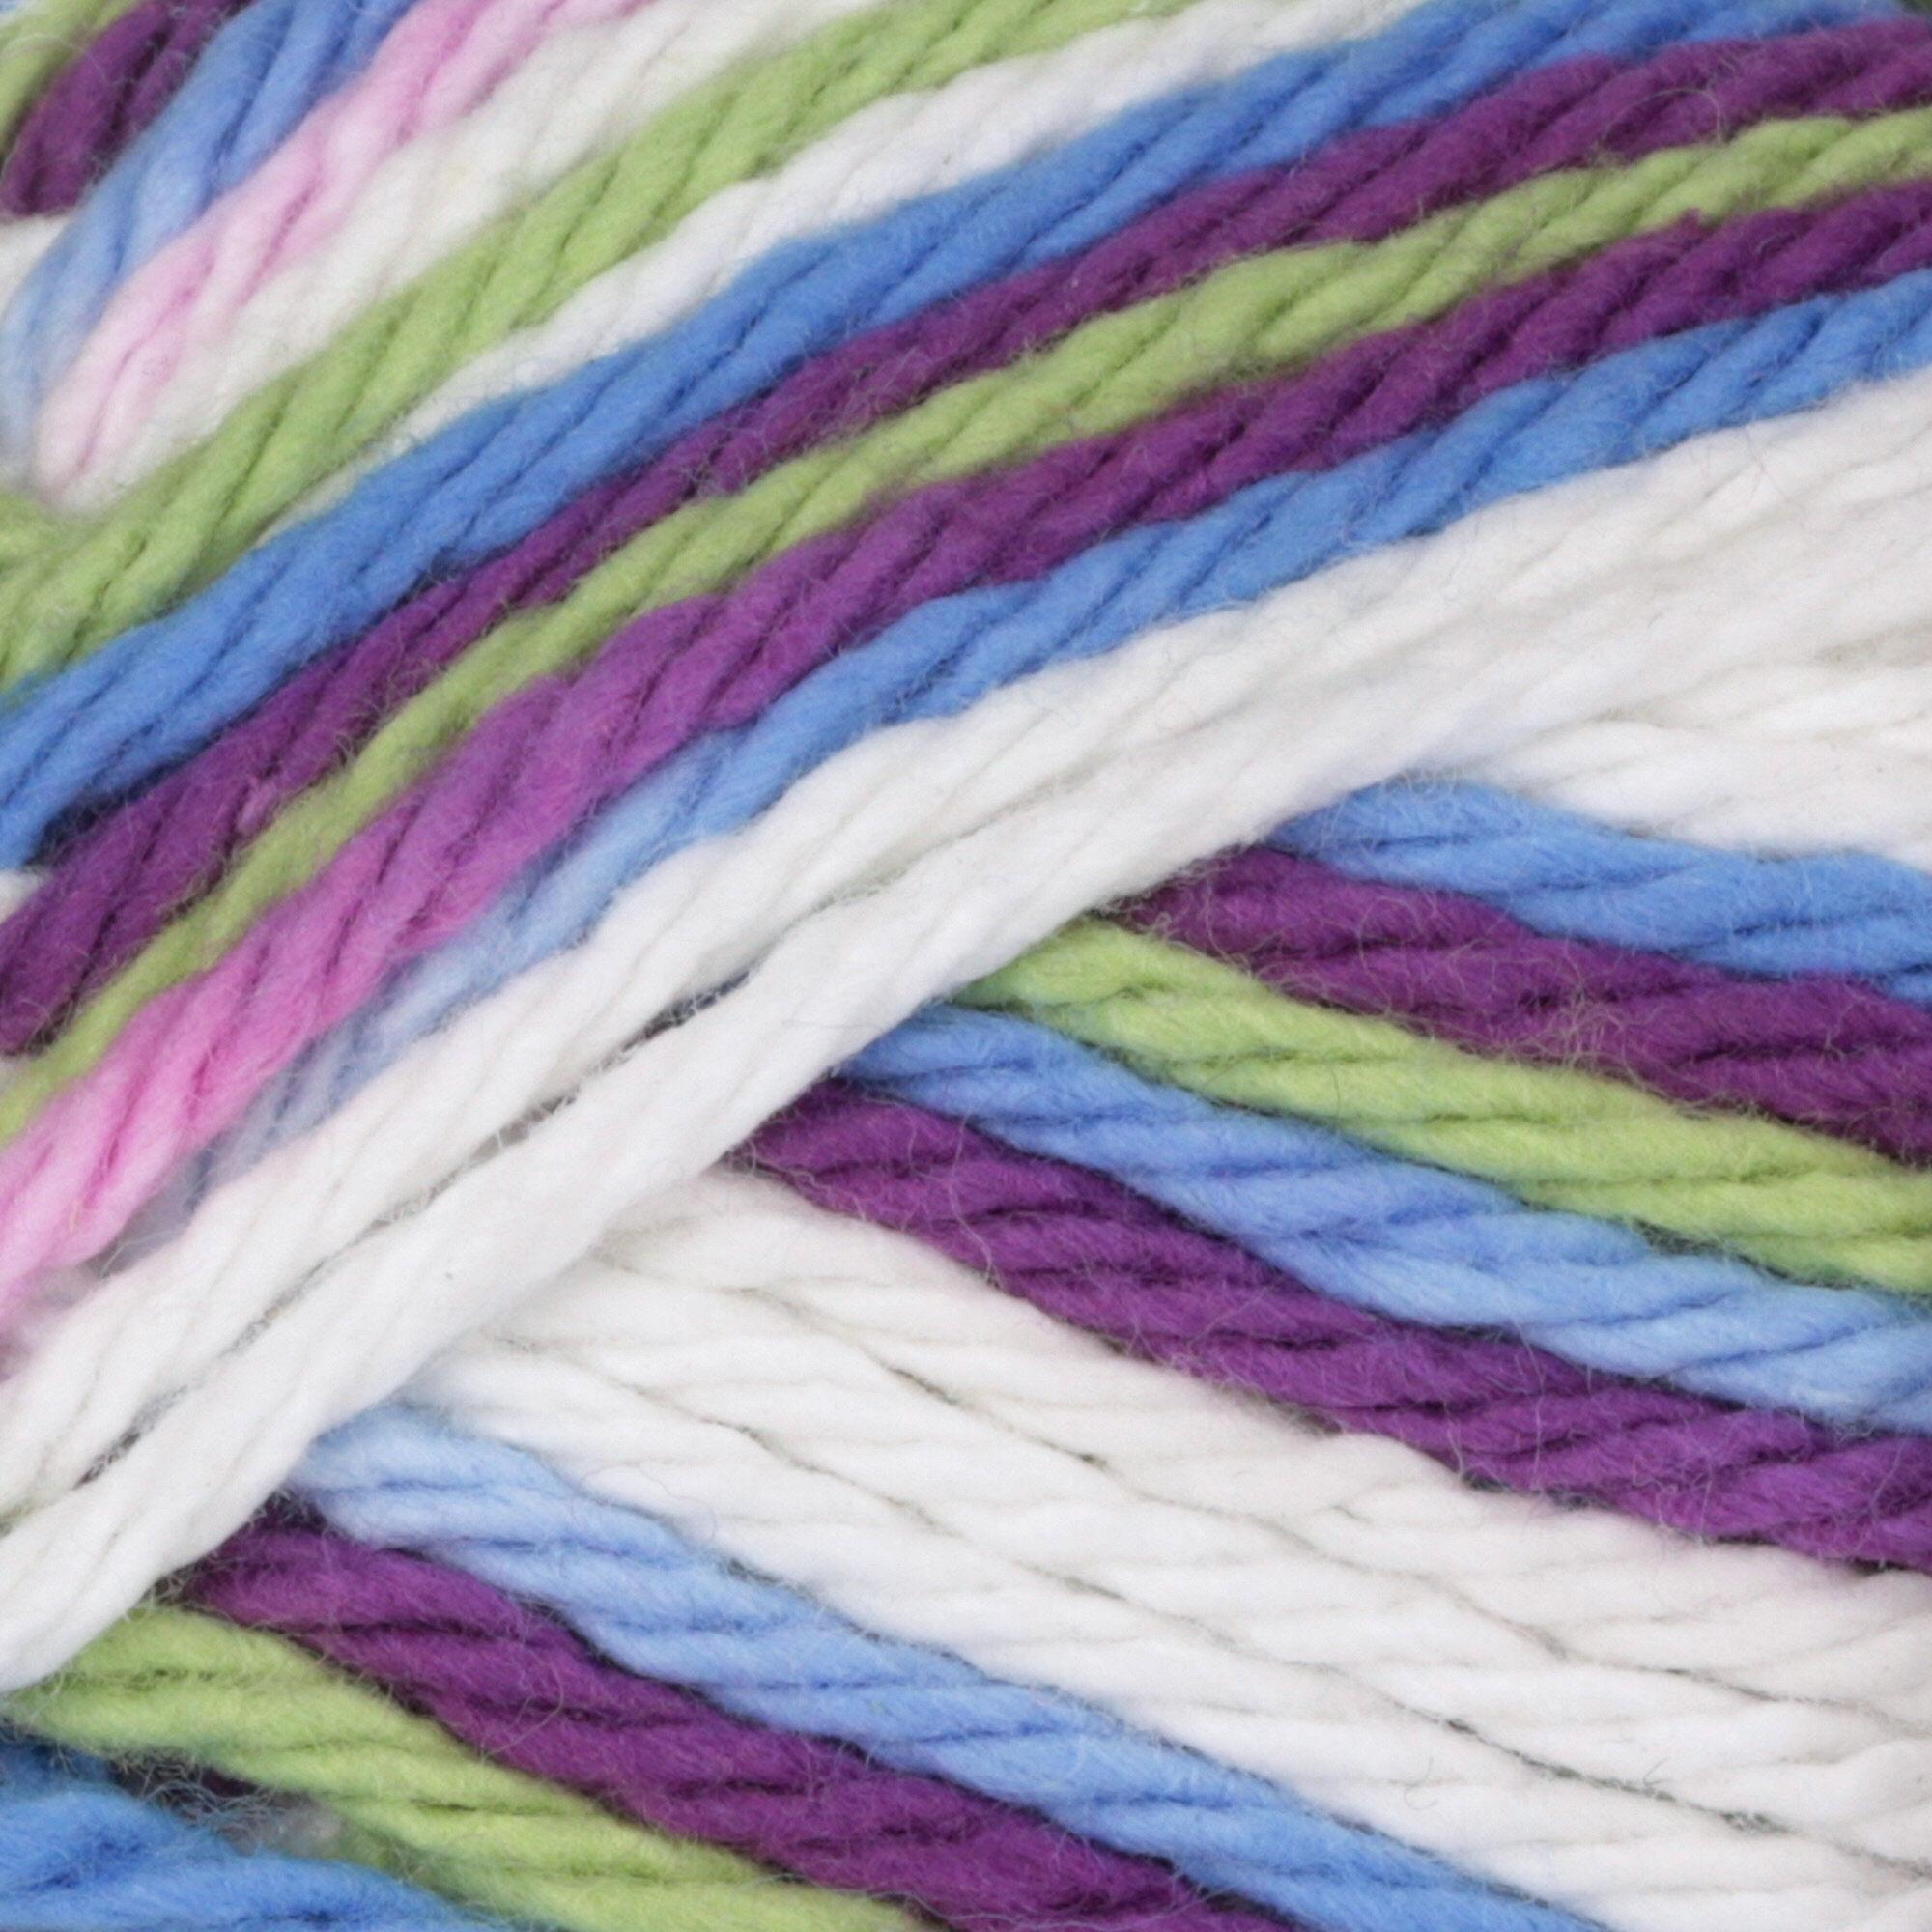 ... Bernat Handicrafter Cotton Ombres Yarn 4545c1e02